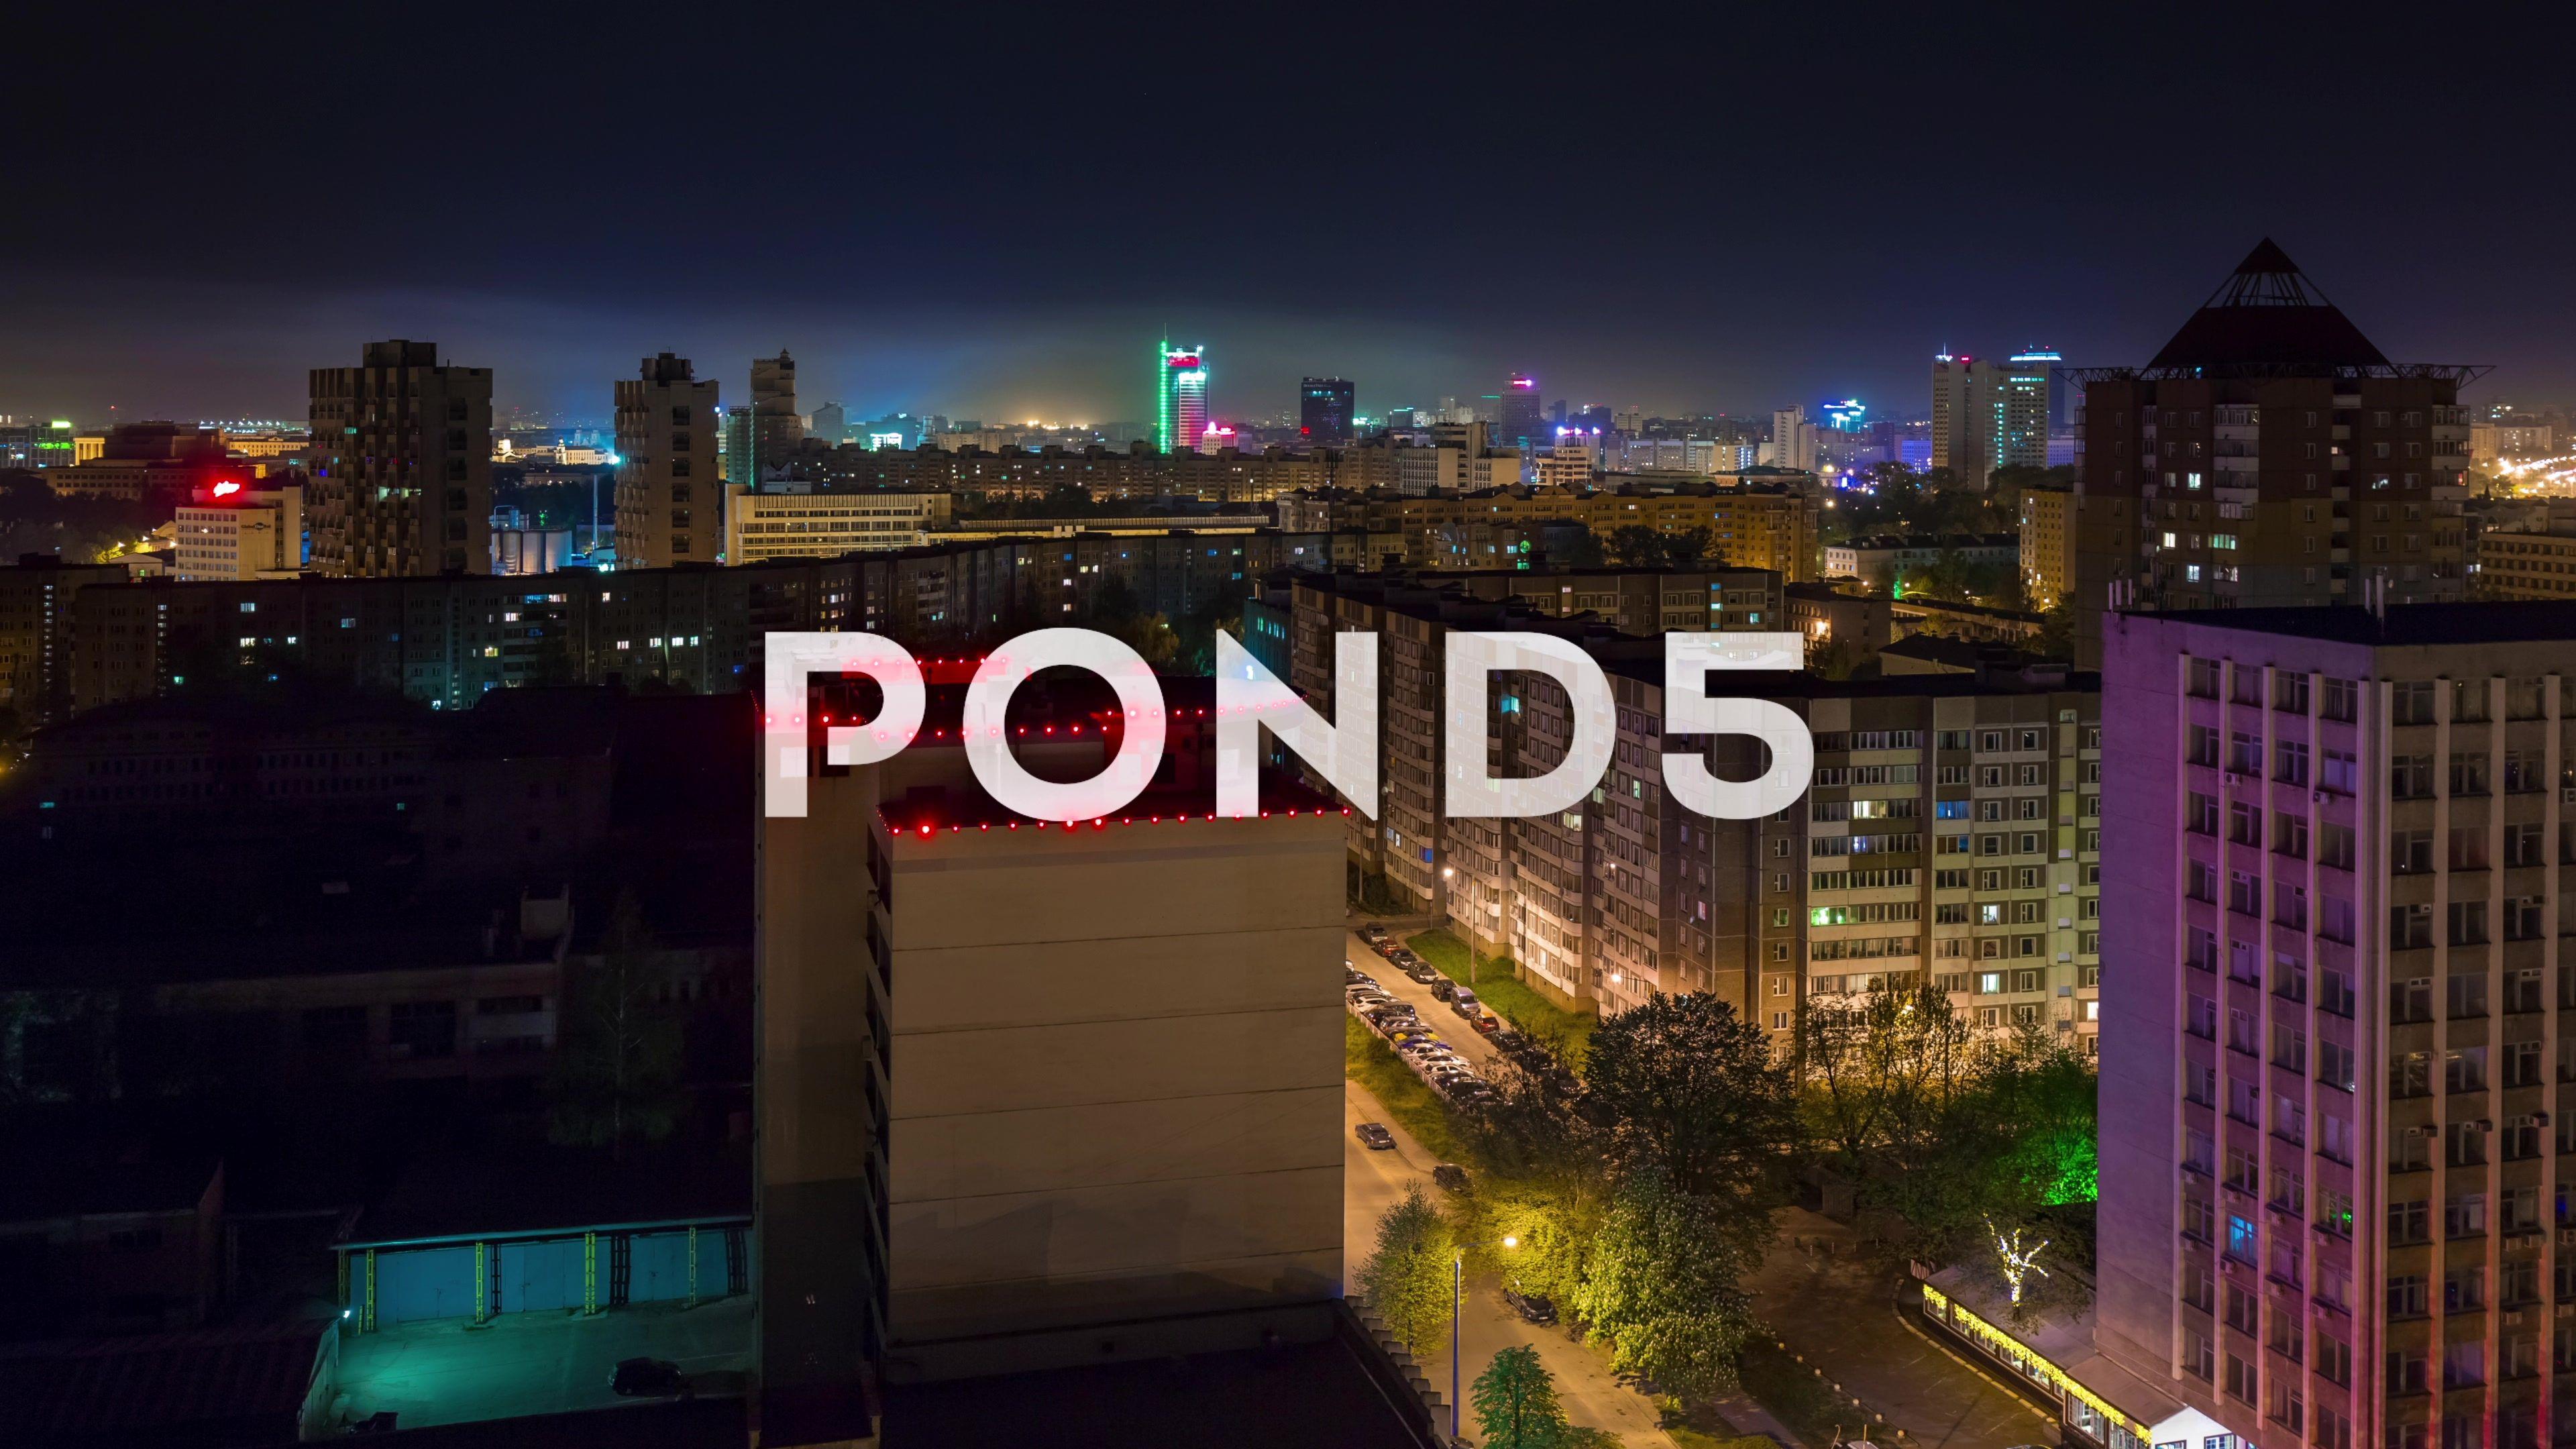 night illumination city roof top panorama 4k time lapse minsk rh pinterest com